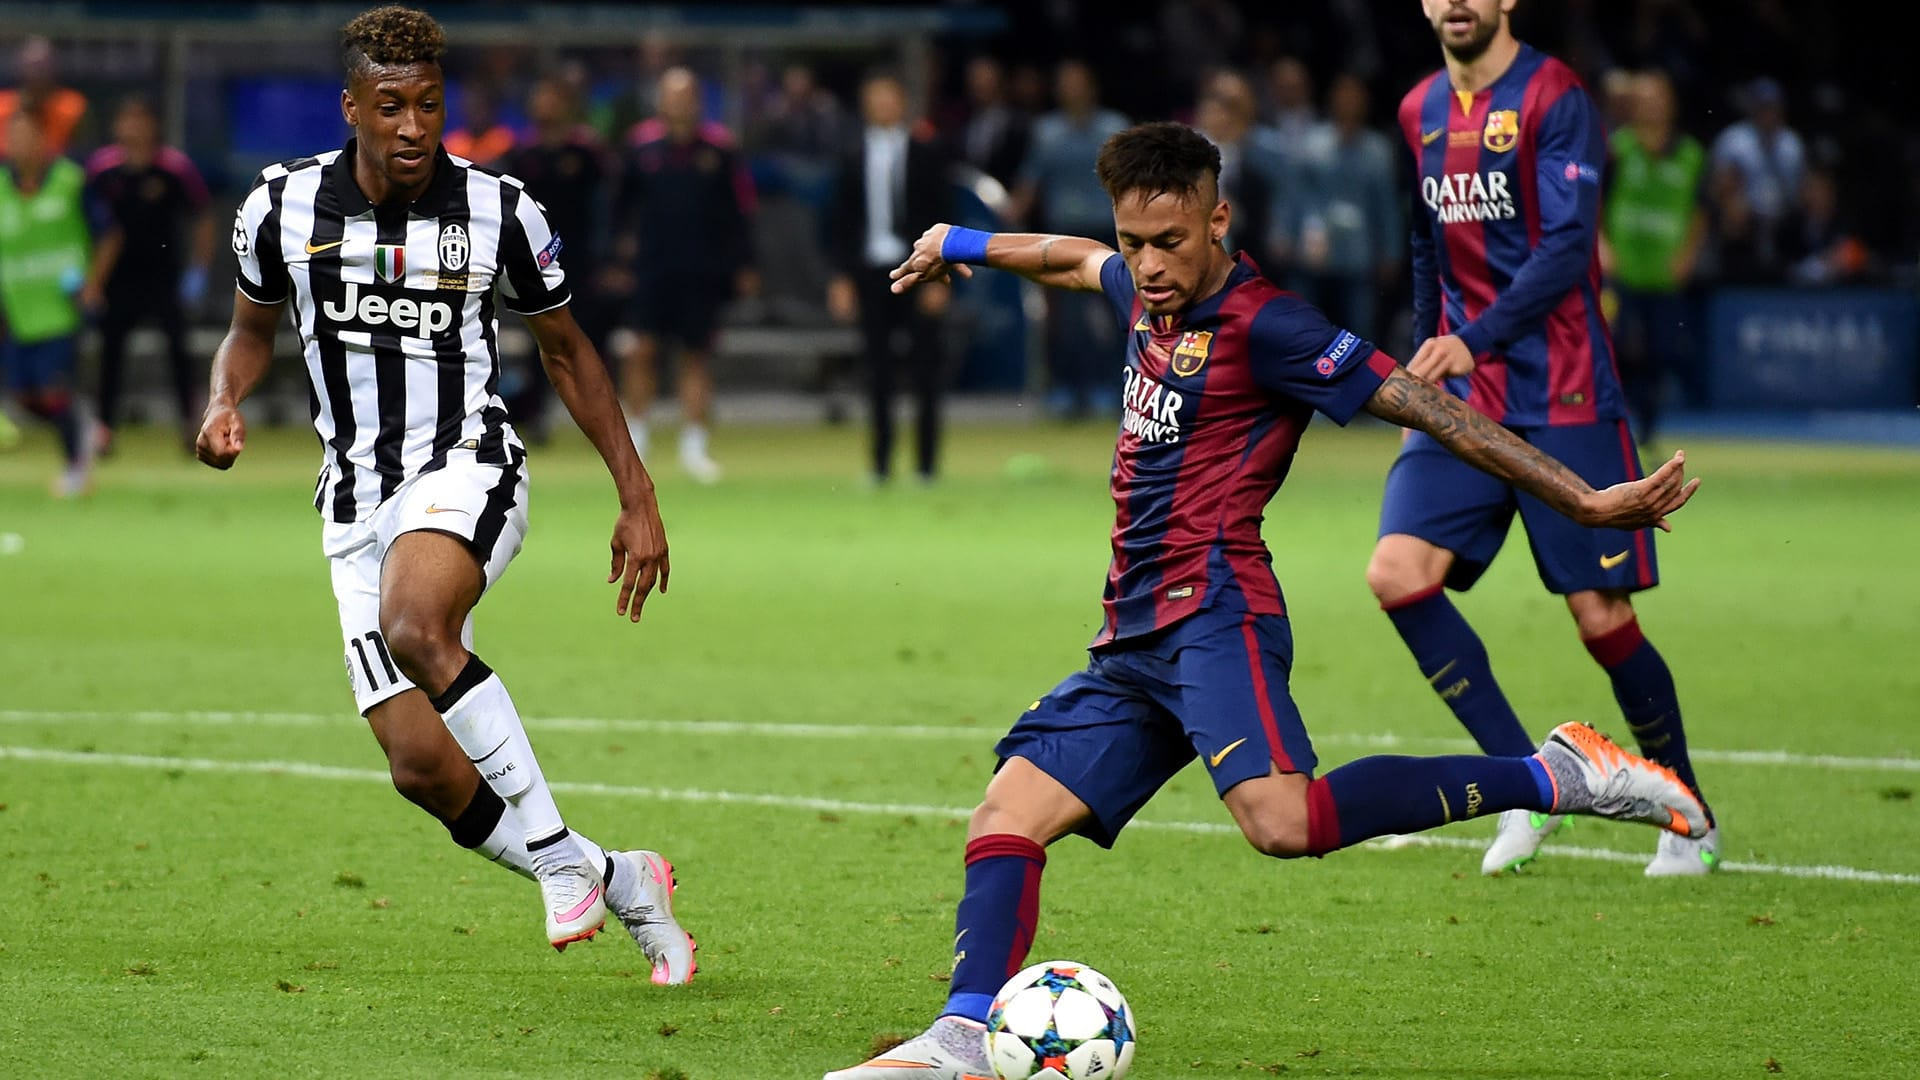 chaussures-football-nike-hypervenom-2-neymar-champions-league-finale-2015-janvier-2019